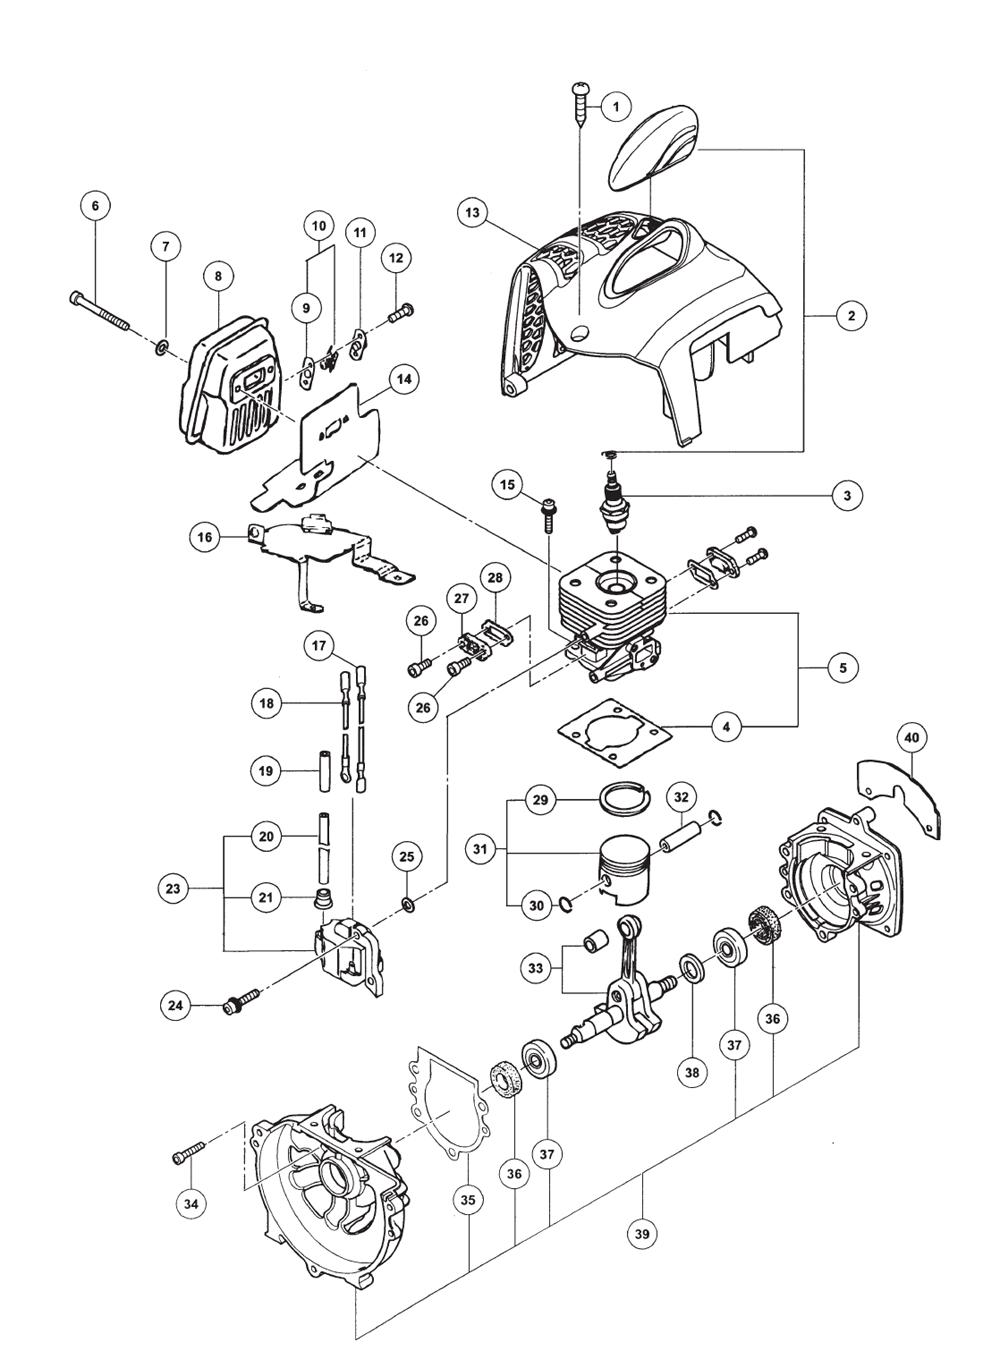 Buy Tanaka TBC-240PFS Inspire 23 cc 1.2 hp S-Start